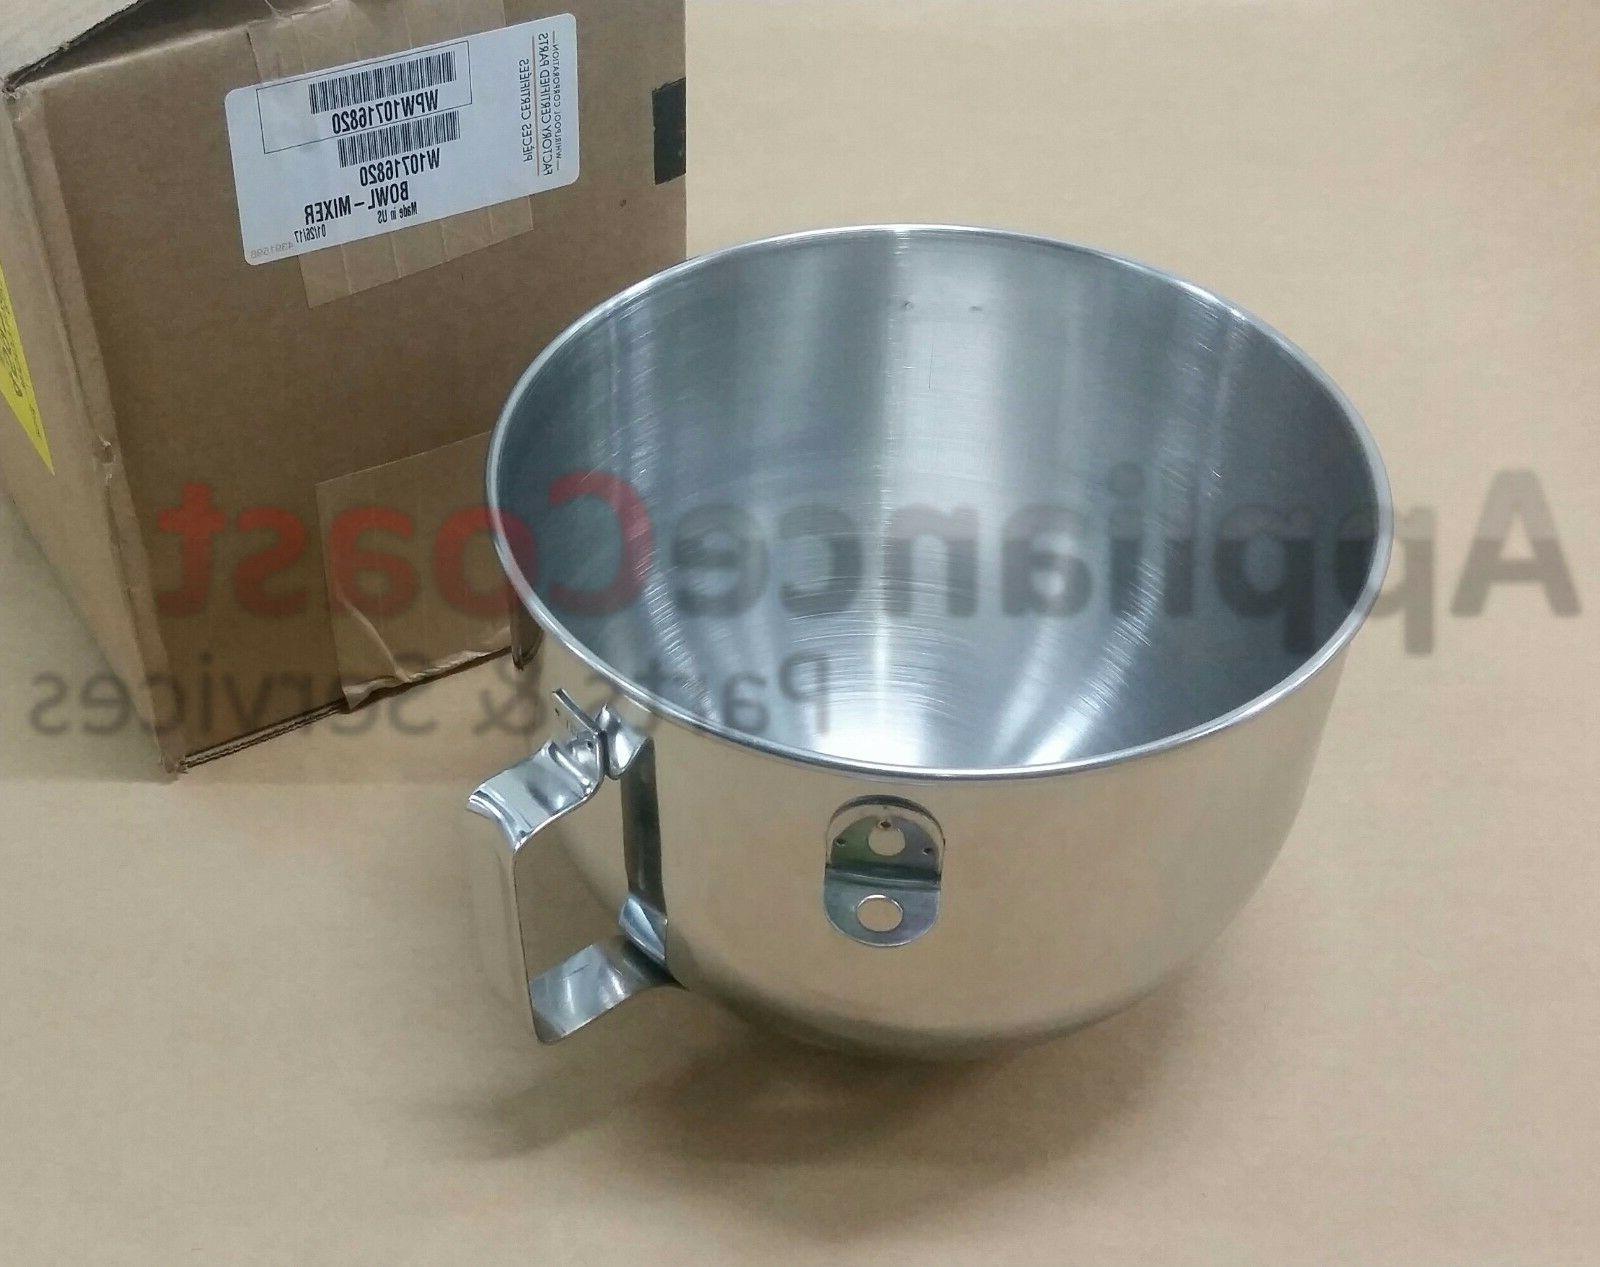 w10716820 new oem mixer bowl w handle